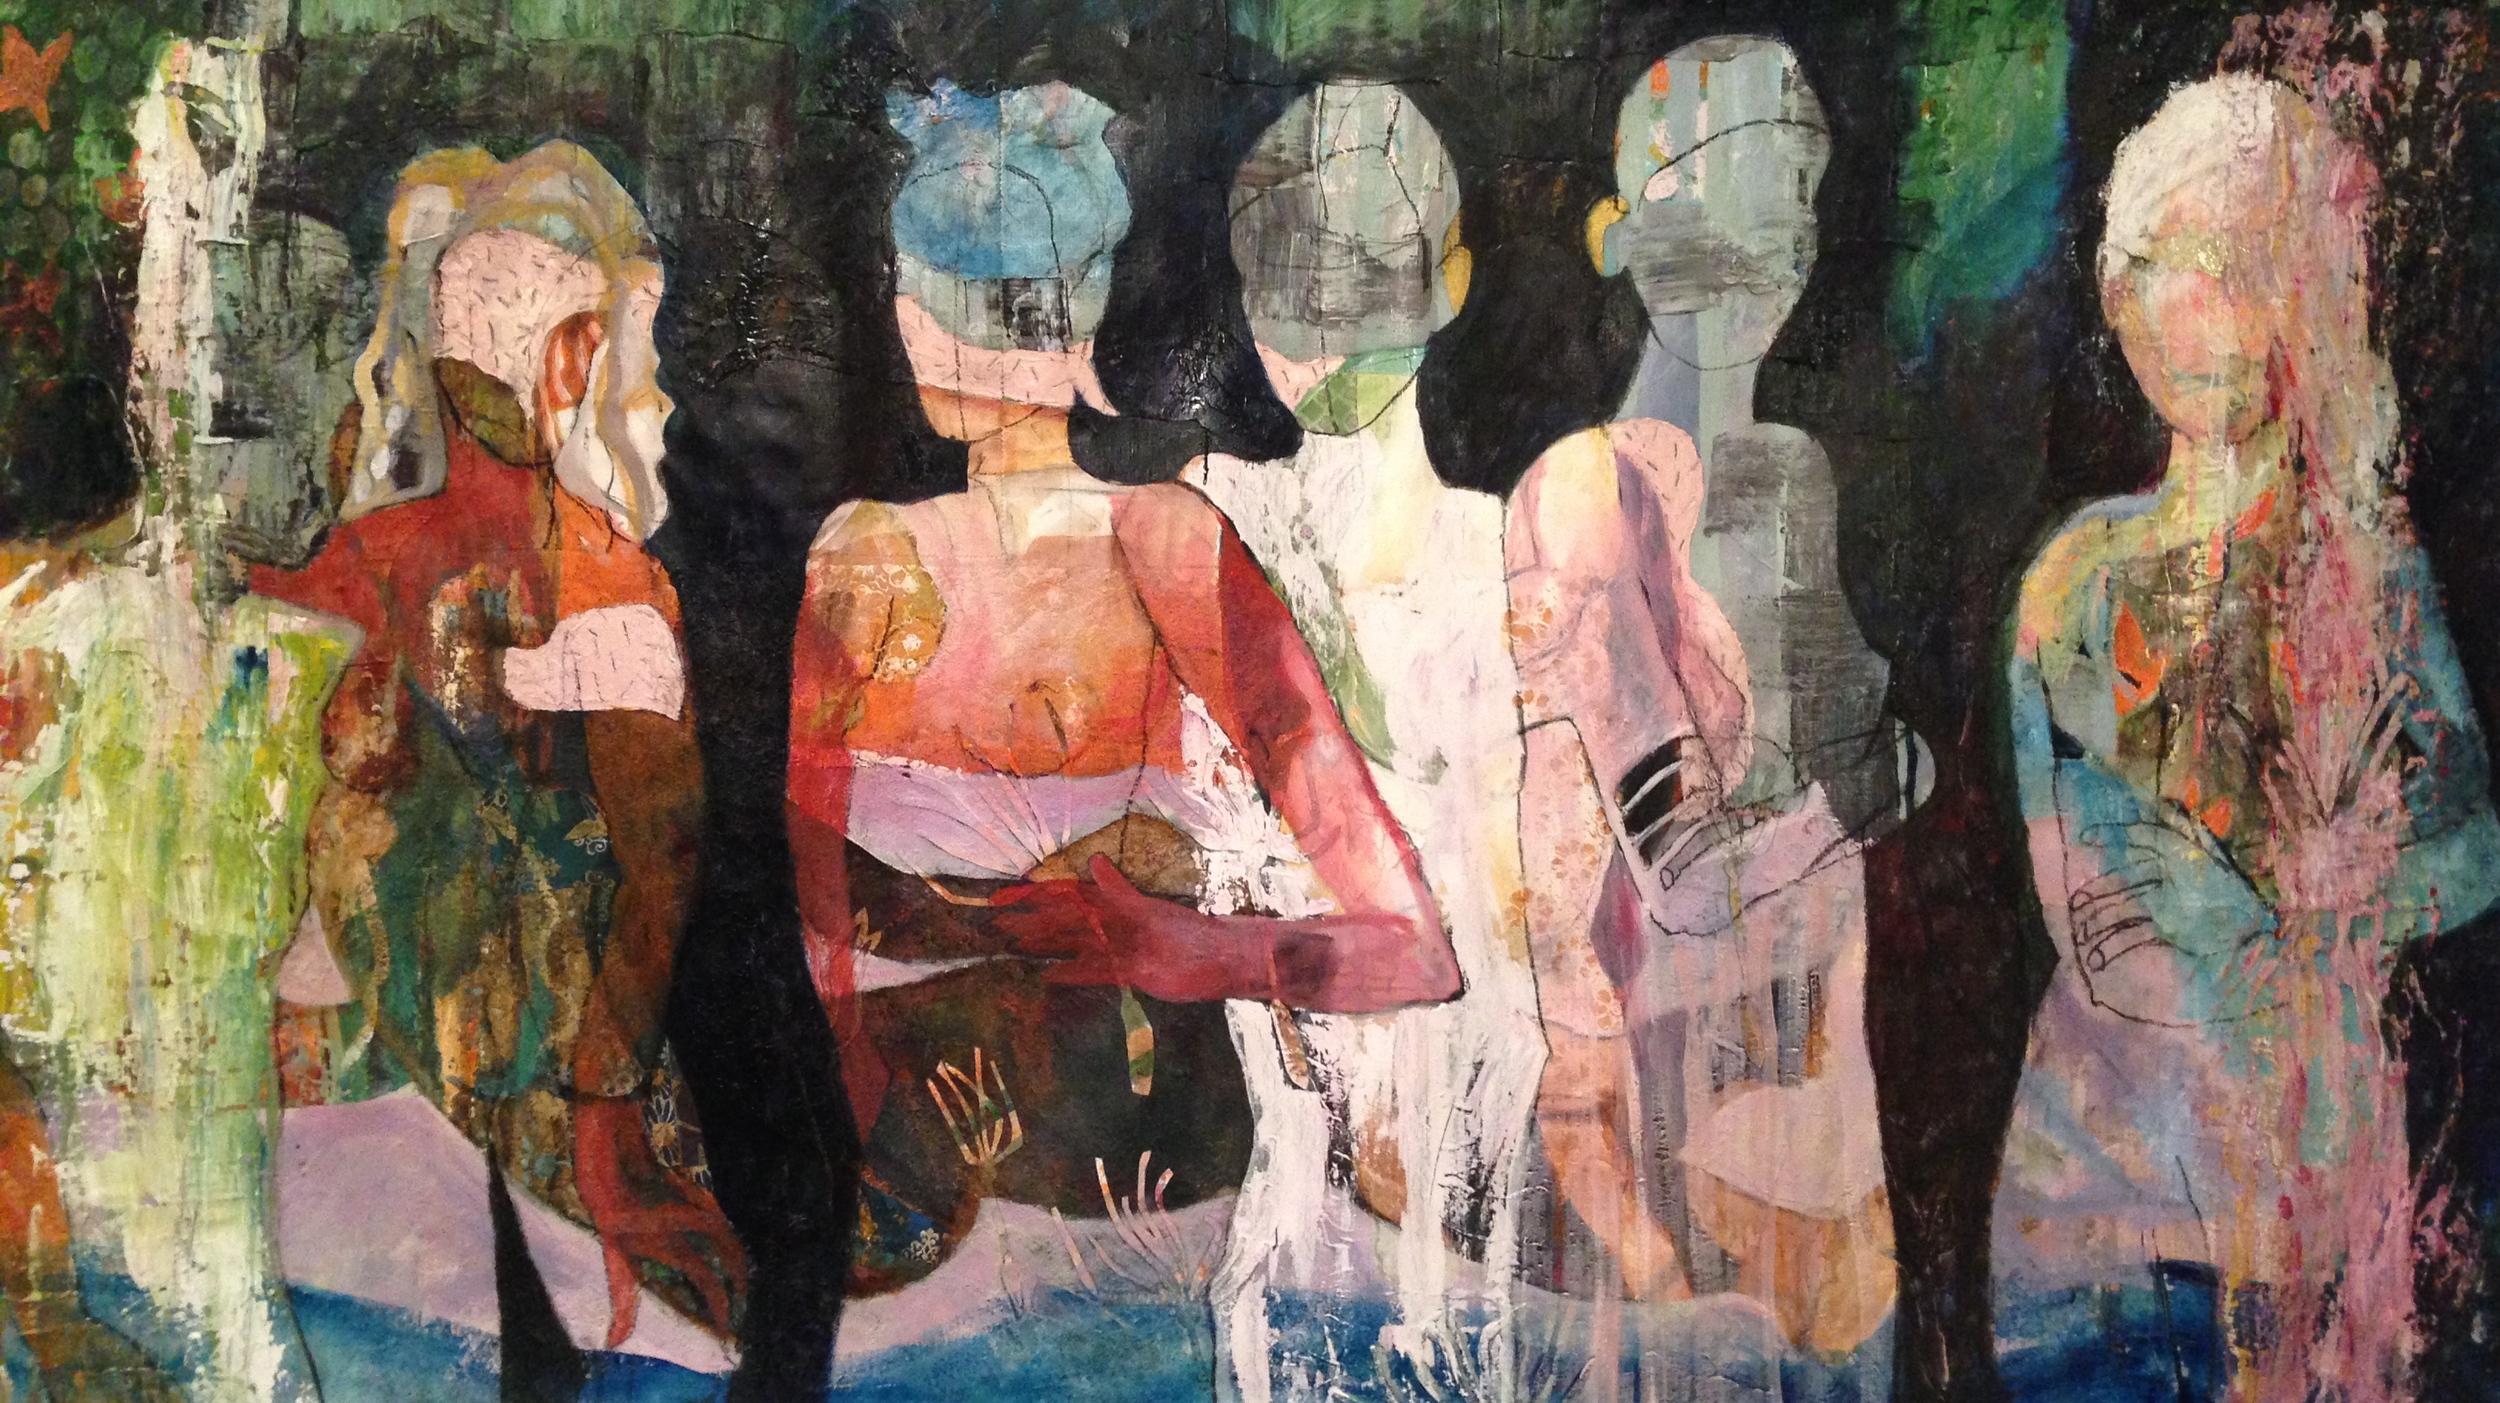 Illusion, Acrylic/ Oil/ Collage on canvas, 200 x 100 cm, 2015.